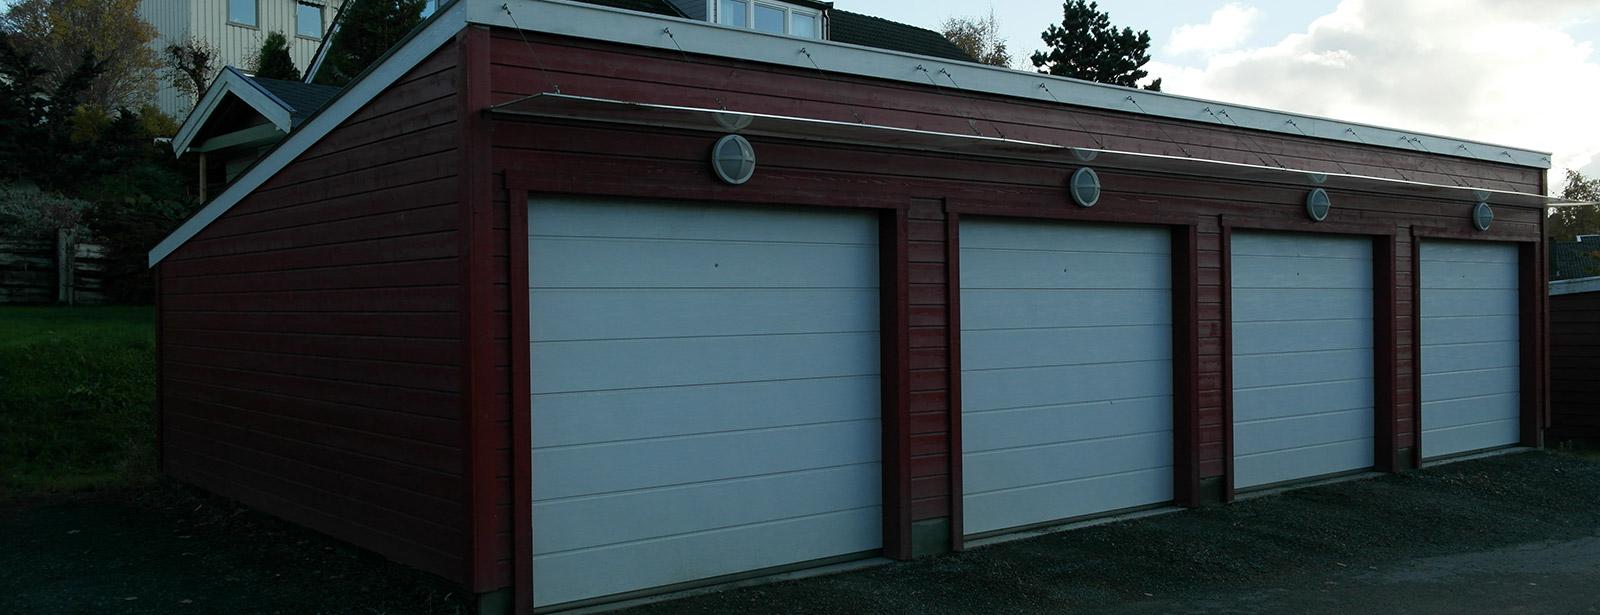 Garasje Trondheim